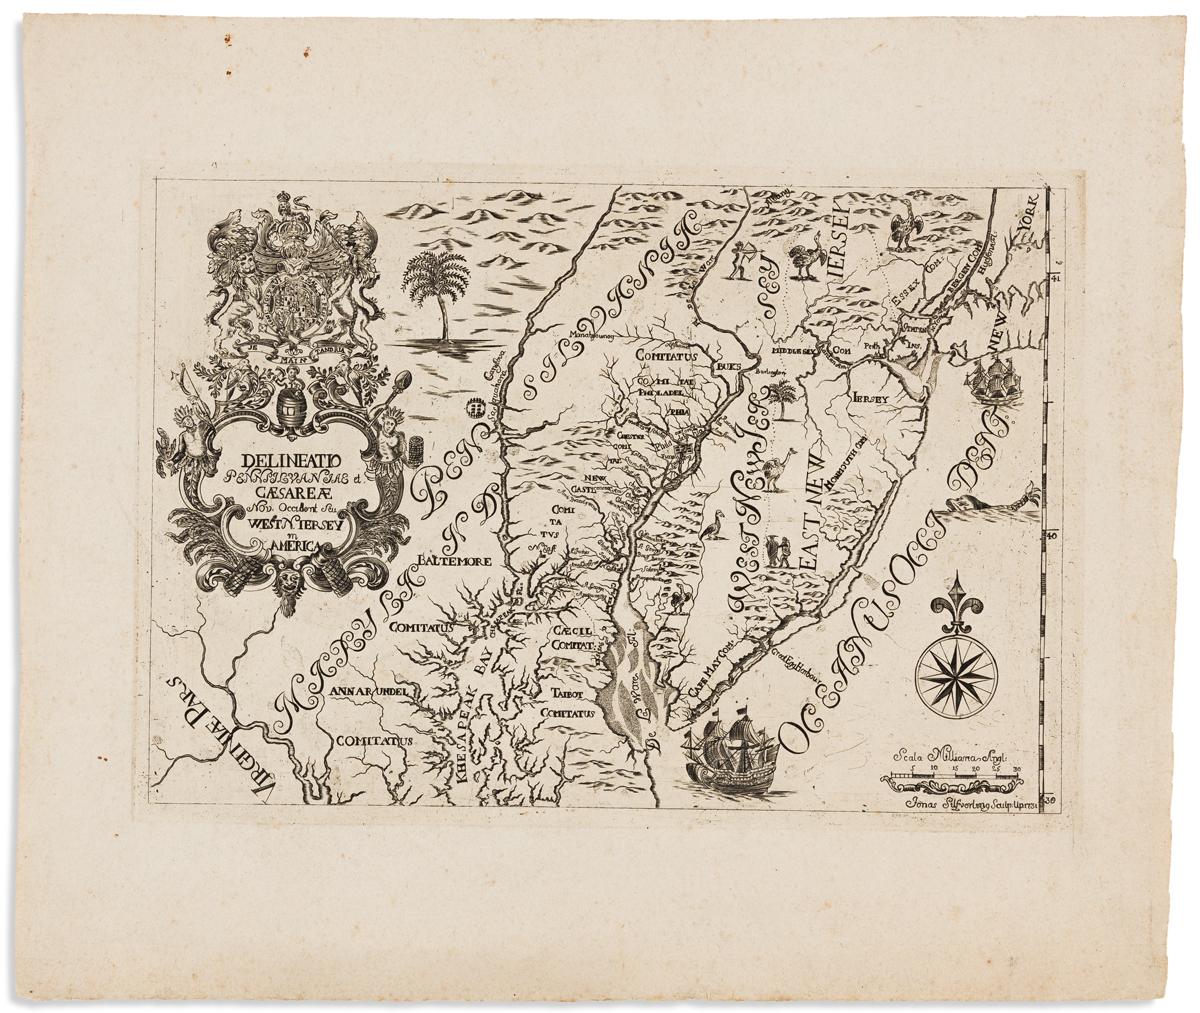 BIORCK, ERIC TOBIAS; and SILFVERLING, JONAS, engr. Delineatio Pennsilvaniae et Caesareae Nov. Occident Seu West N. Jersey in America.